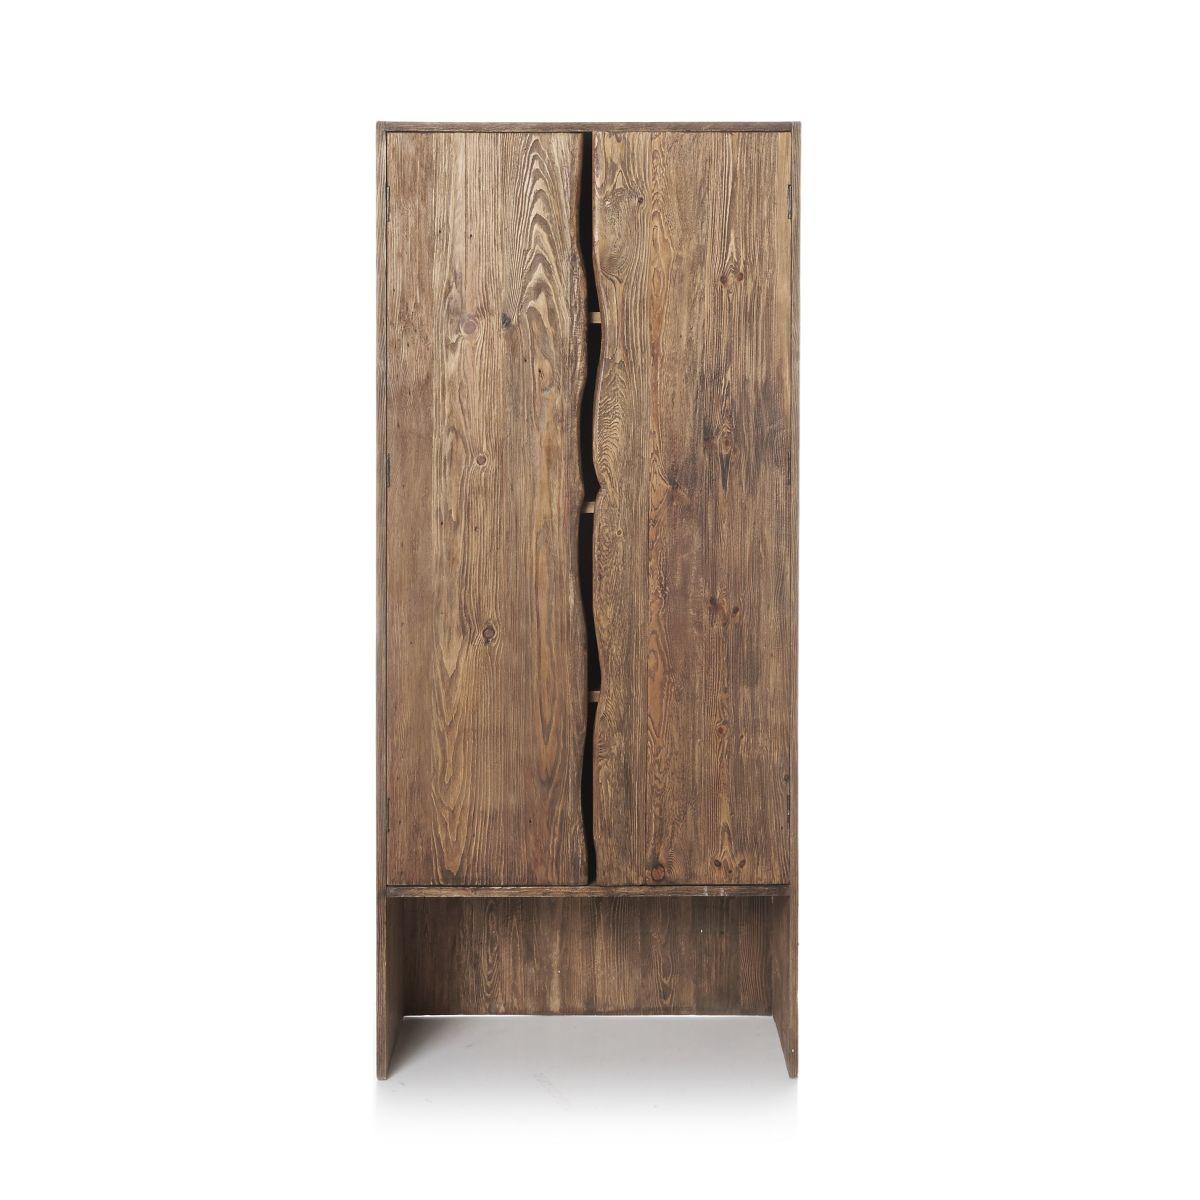 Kleiderschrank, Natur-Look, Recyclingholz